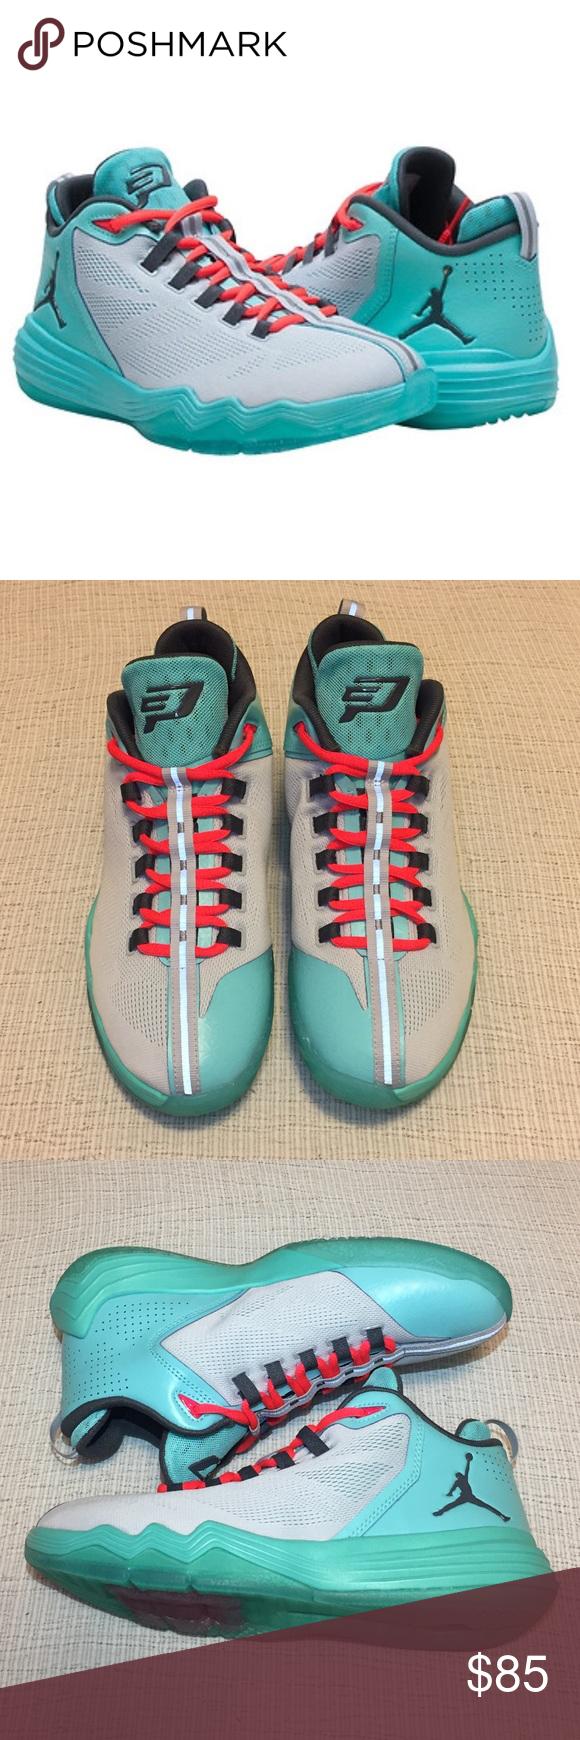 size 40 29332 7bc0d NWOB Boy s - Nike Jordan CP3.IX AE Sneakers New without box. Chris Paul (CP3)  Jordan, basketball shoes. Color  Pure Platinum Dark Gray - Hyper Turquoise  ...